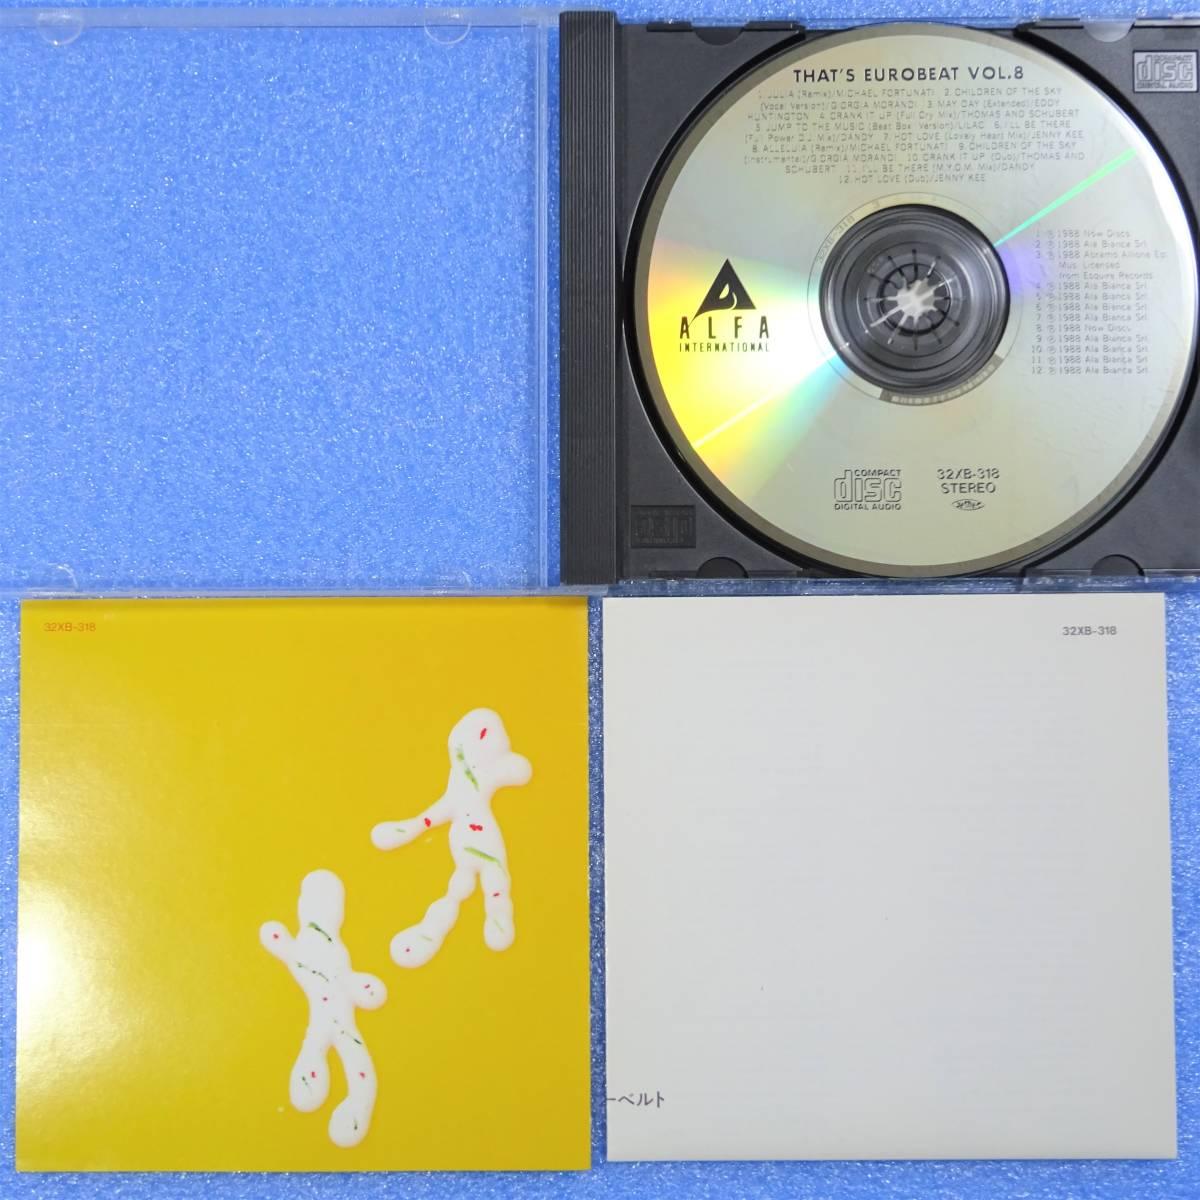 CD ザッツ・ユーロビート THAT'S EUROBEAT Vol.8 1988年 ディスコ ユーロビート マイケル・フォーチュナティ_画像3